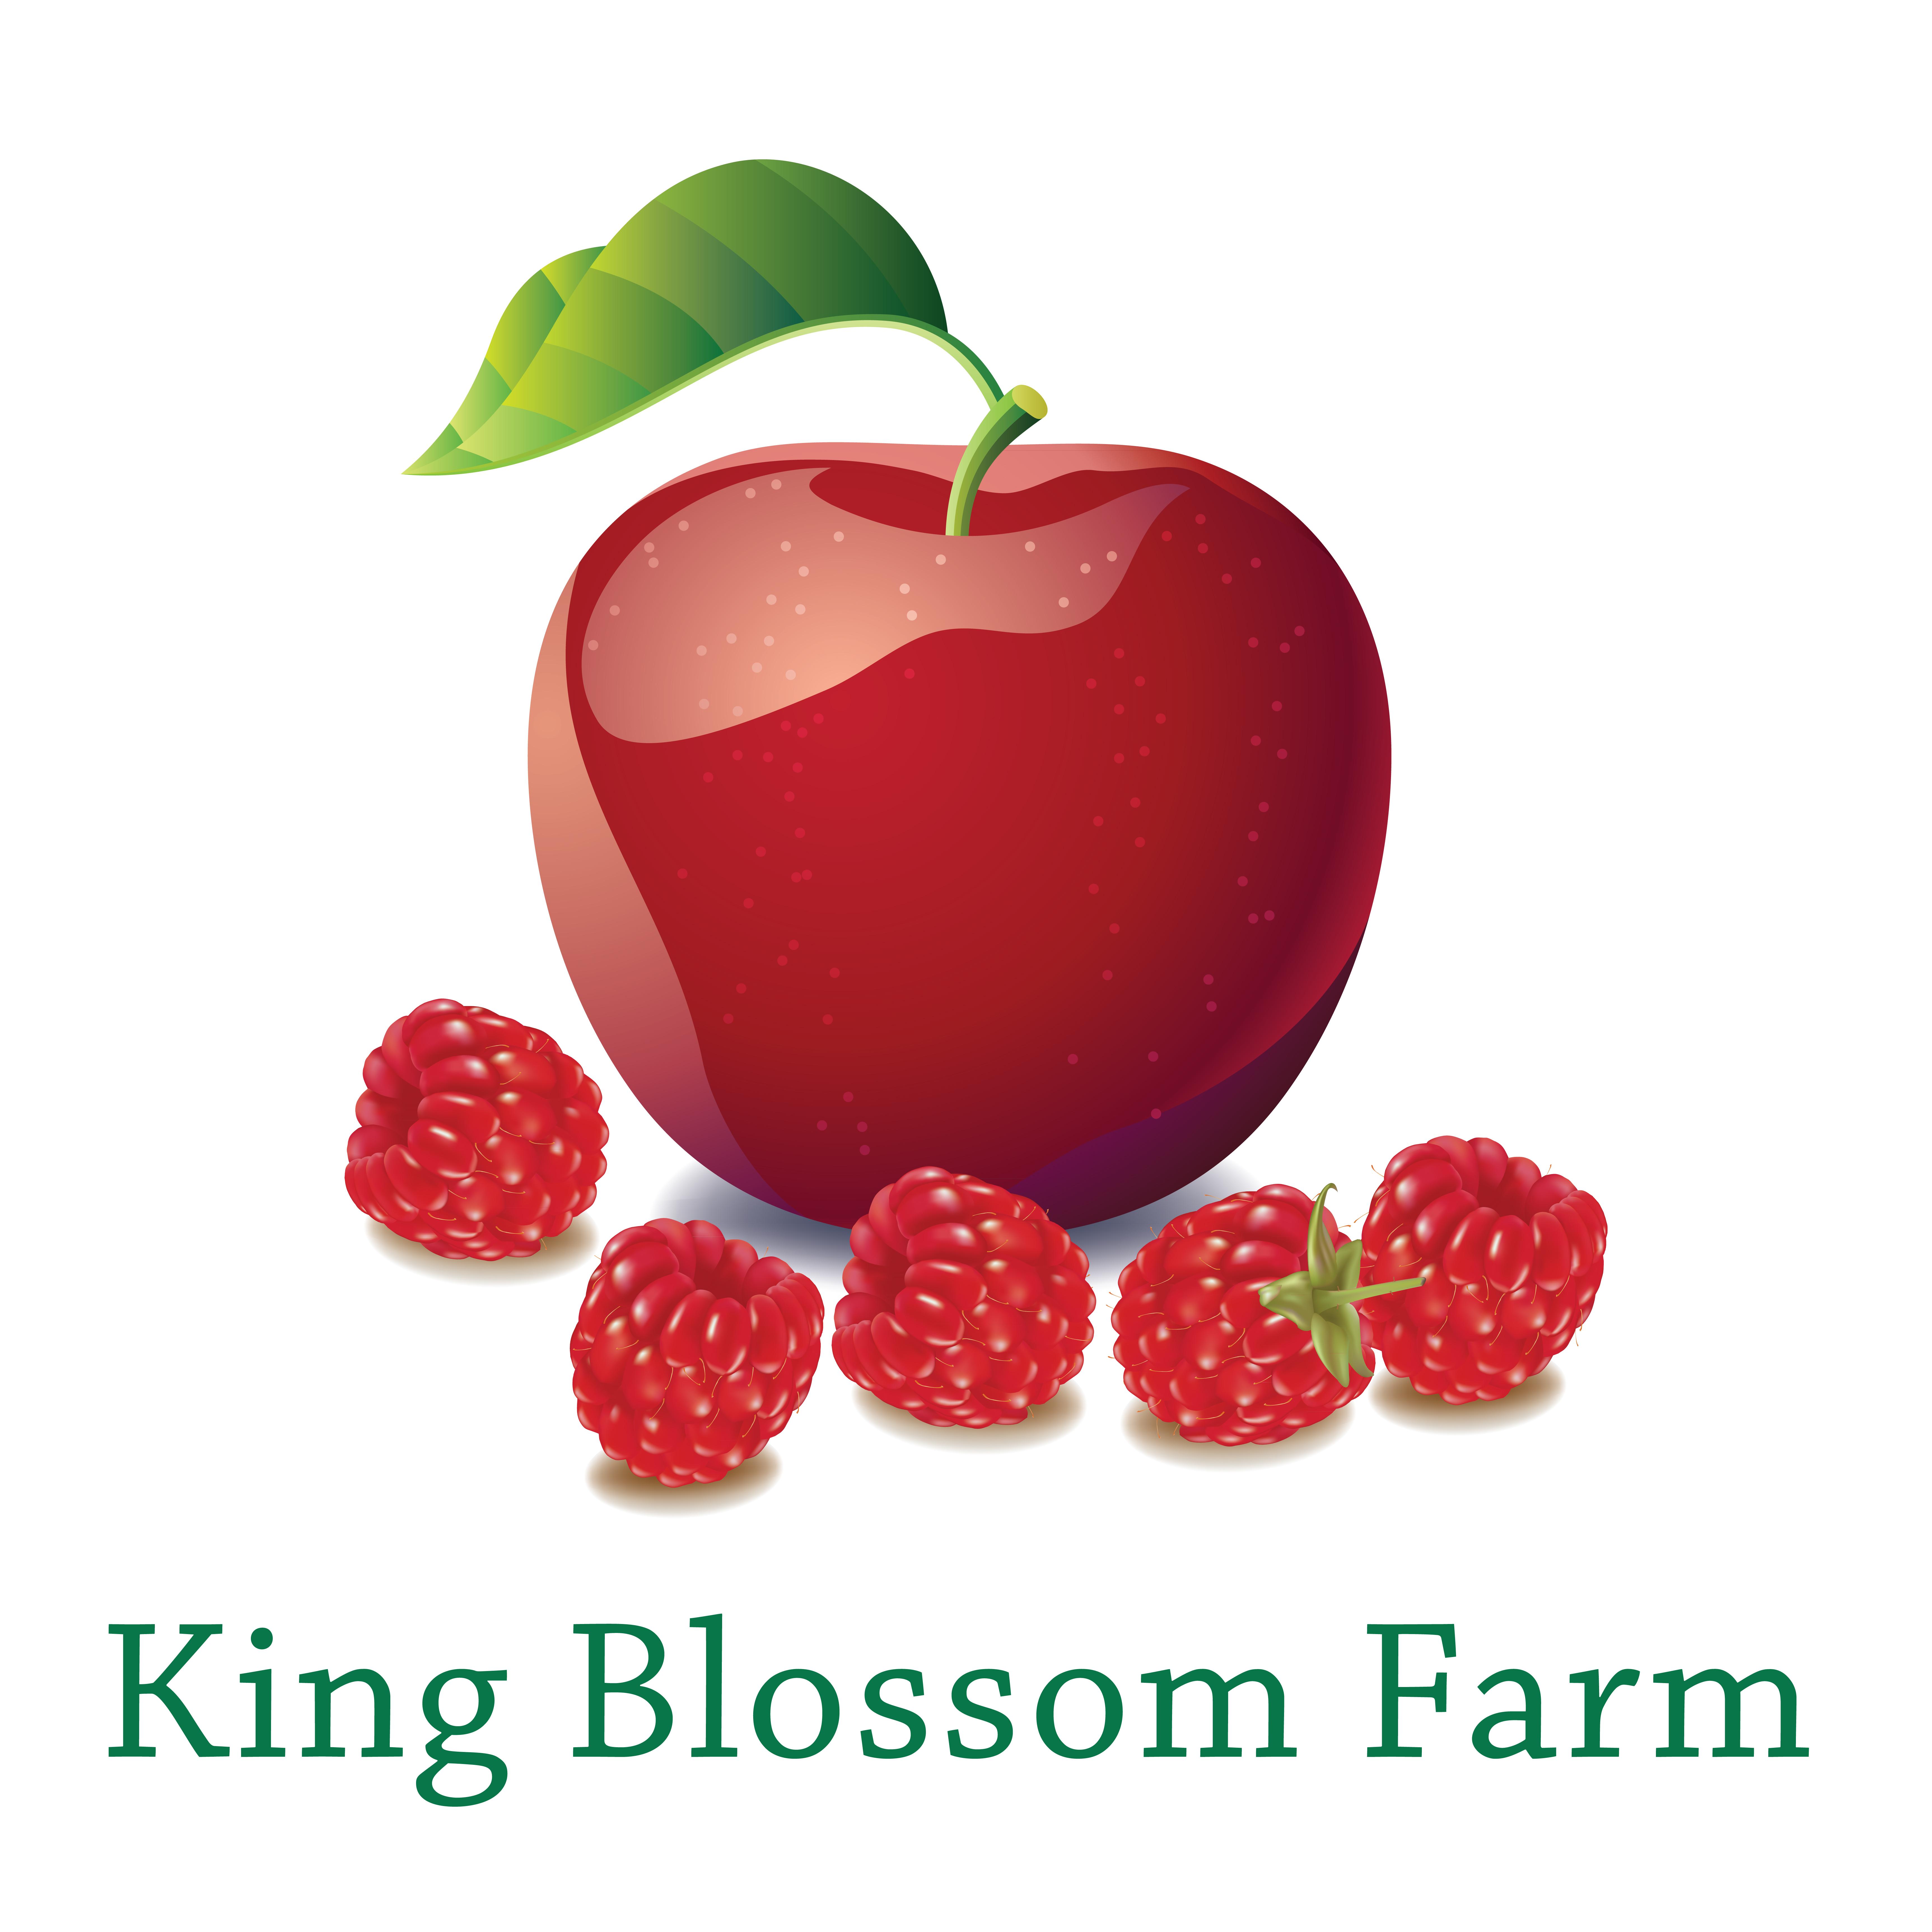 kingblossomfarm.com